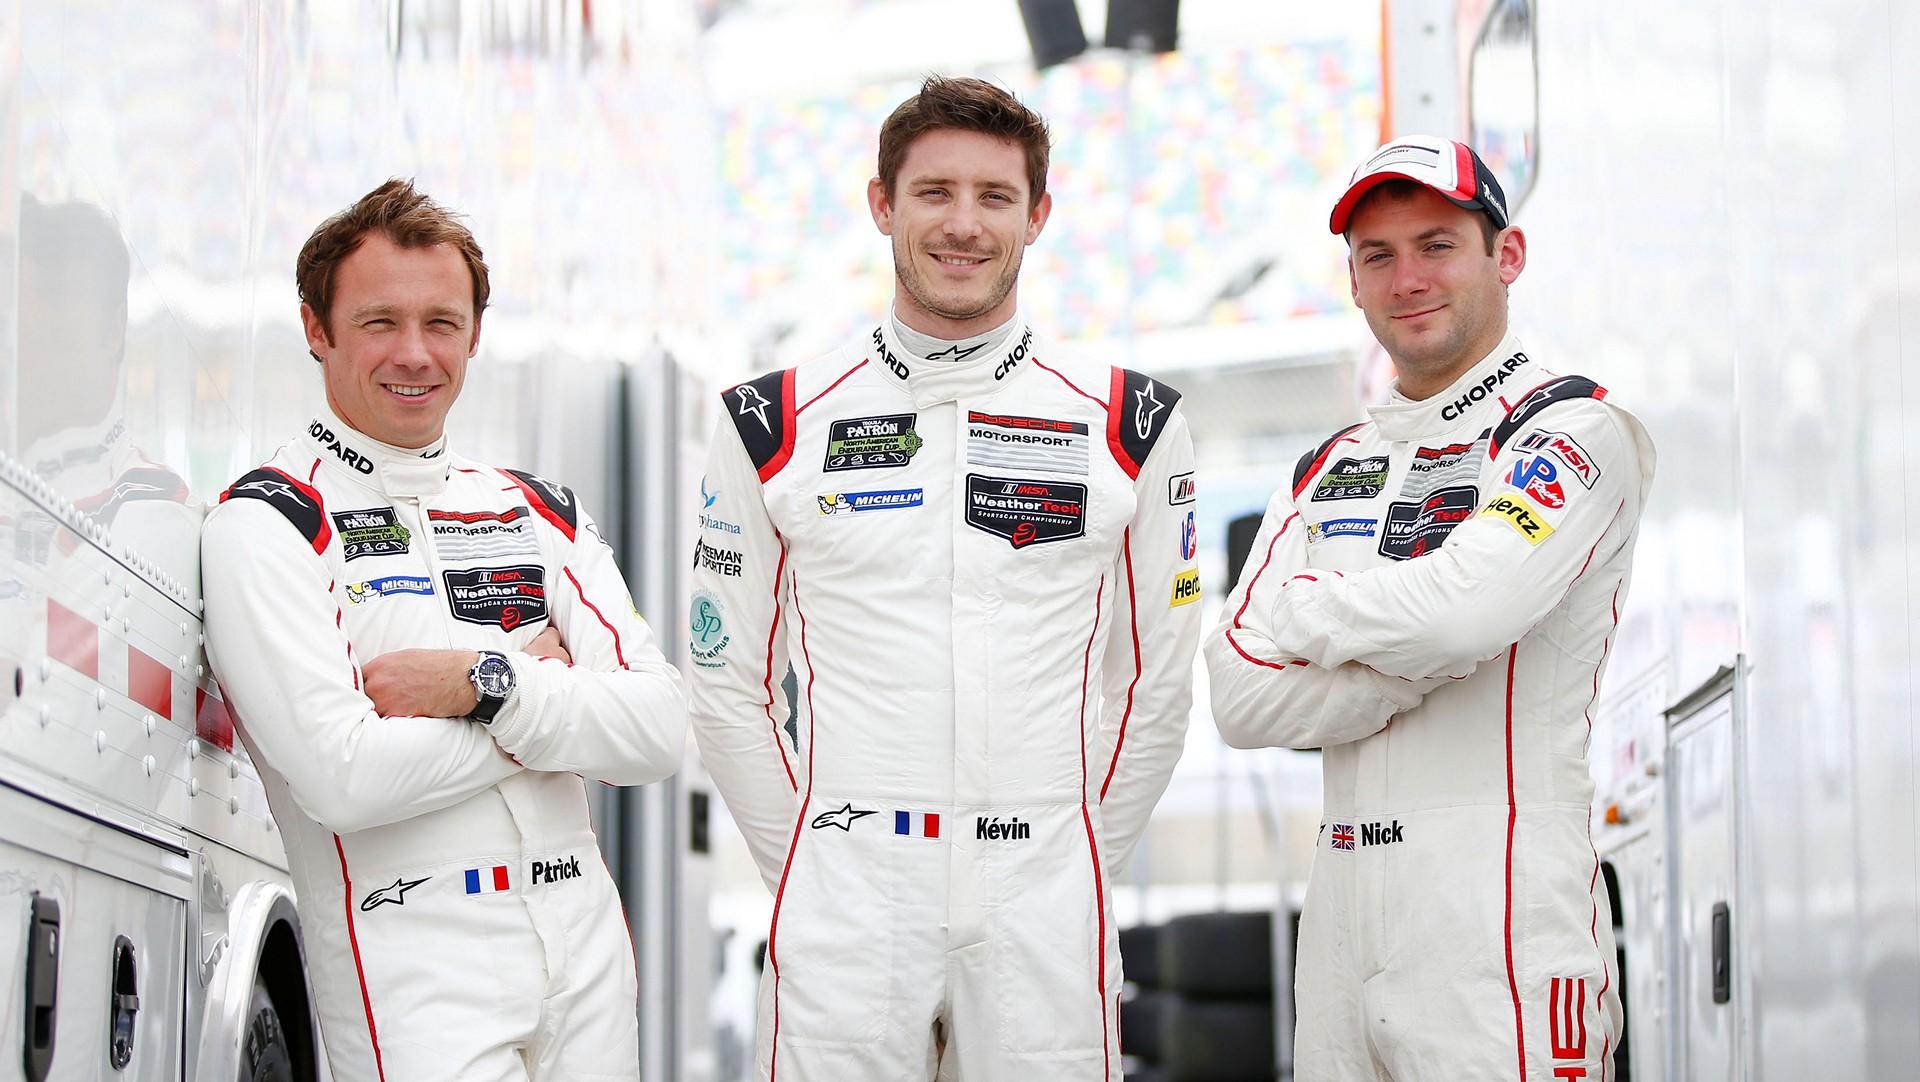 l-r Patrick Pilet, Kevin Estre, Nick Tandy, Daytona, IMSA WeatherTech SportsCar Championship © Dr. Ing. h.c. F. Porsche AG